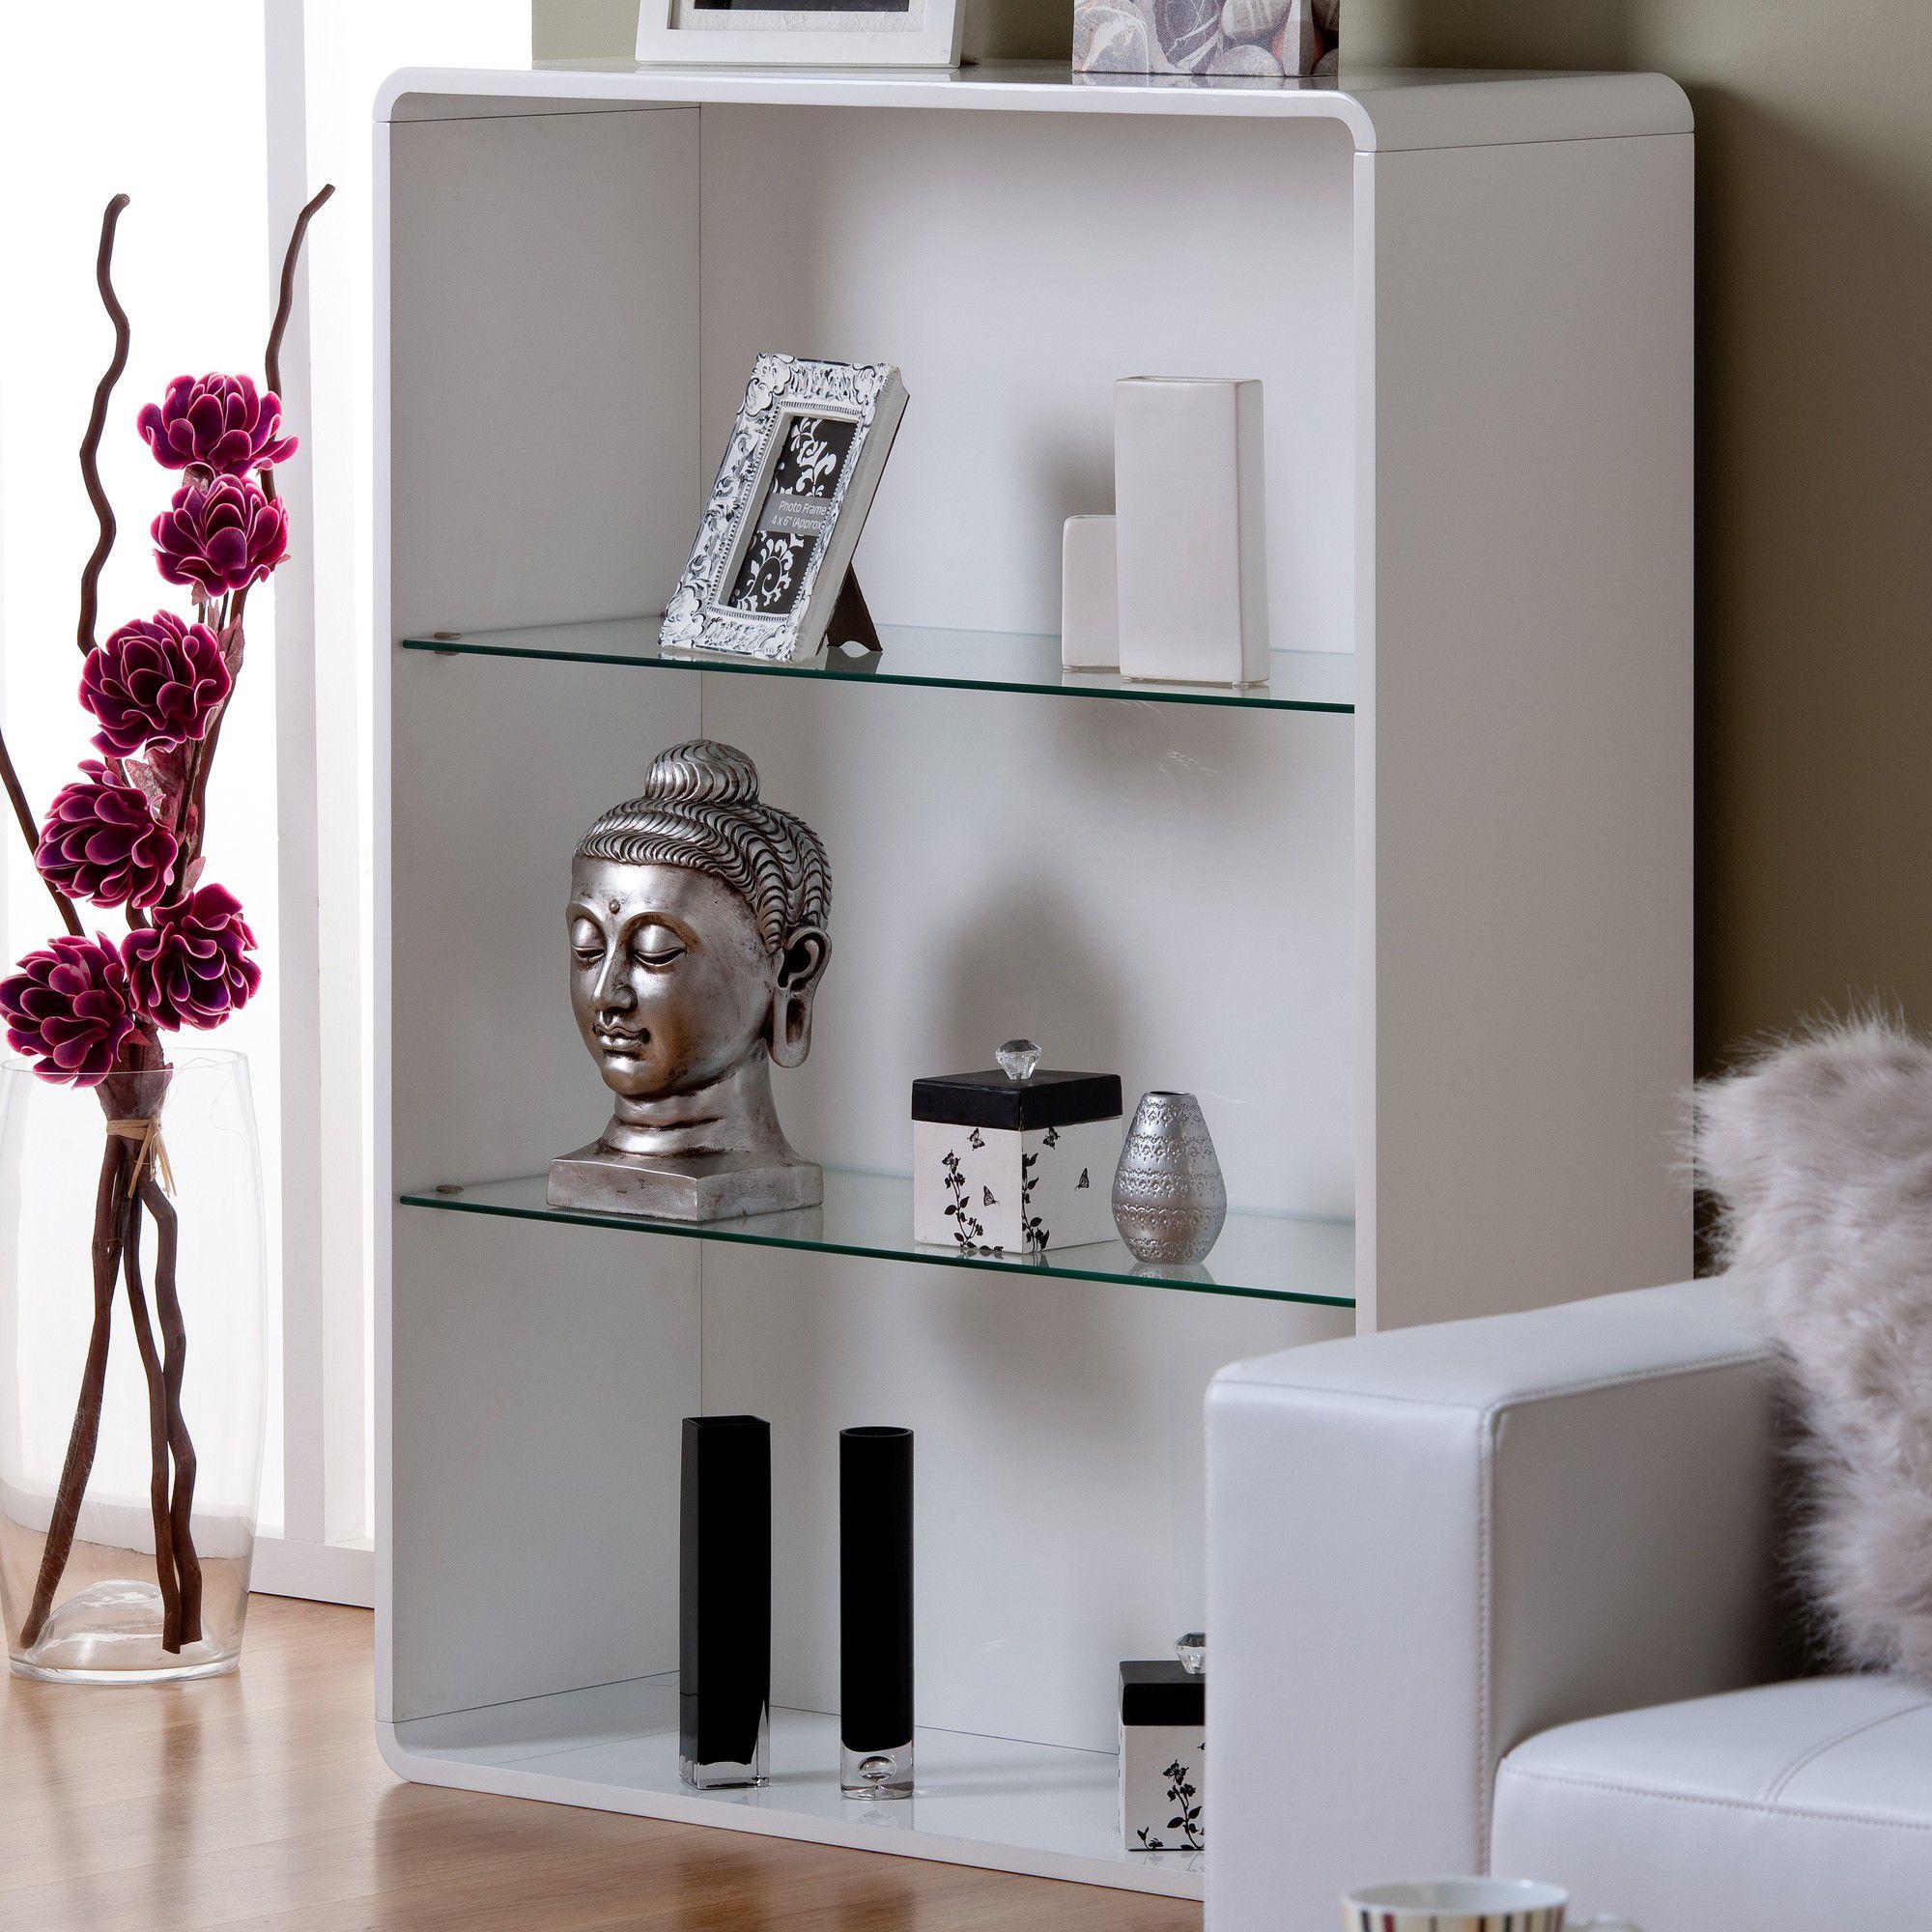 World Furniture Toscana Bookcase - White at Tesco Direct